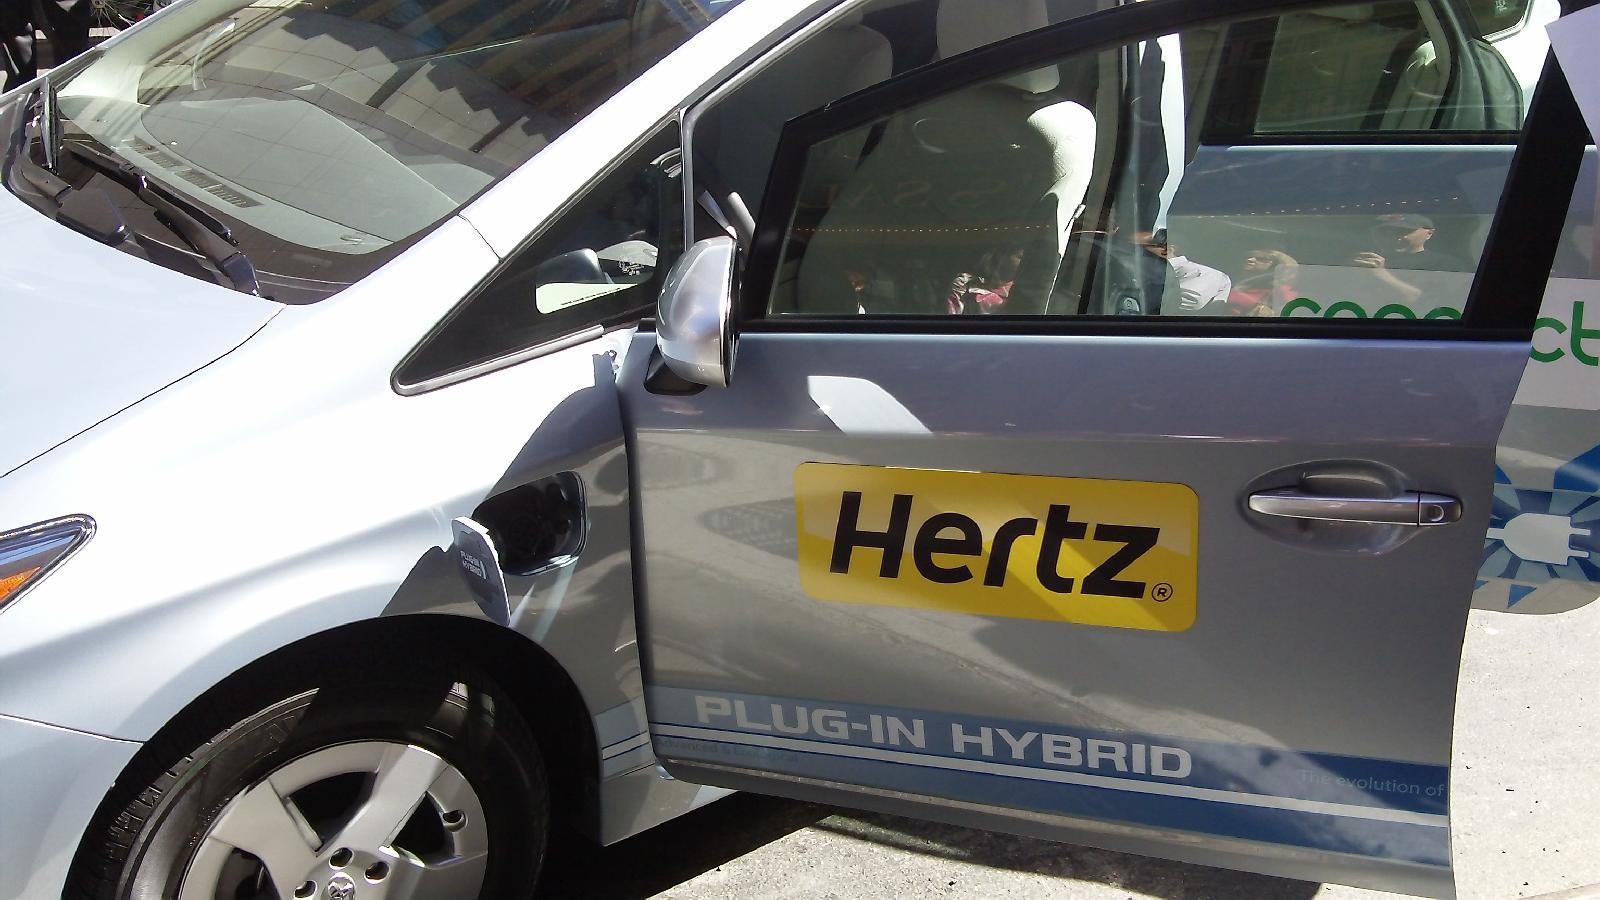 Hertz Rental-Car Fleet Gets Greener, With Higher Average